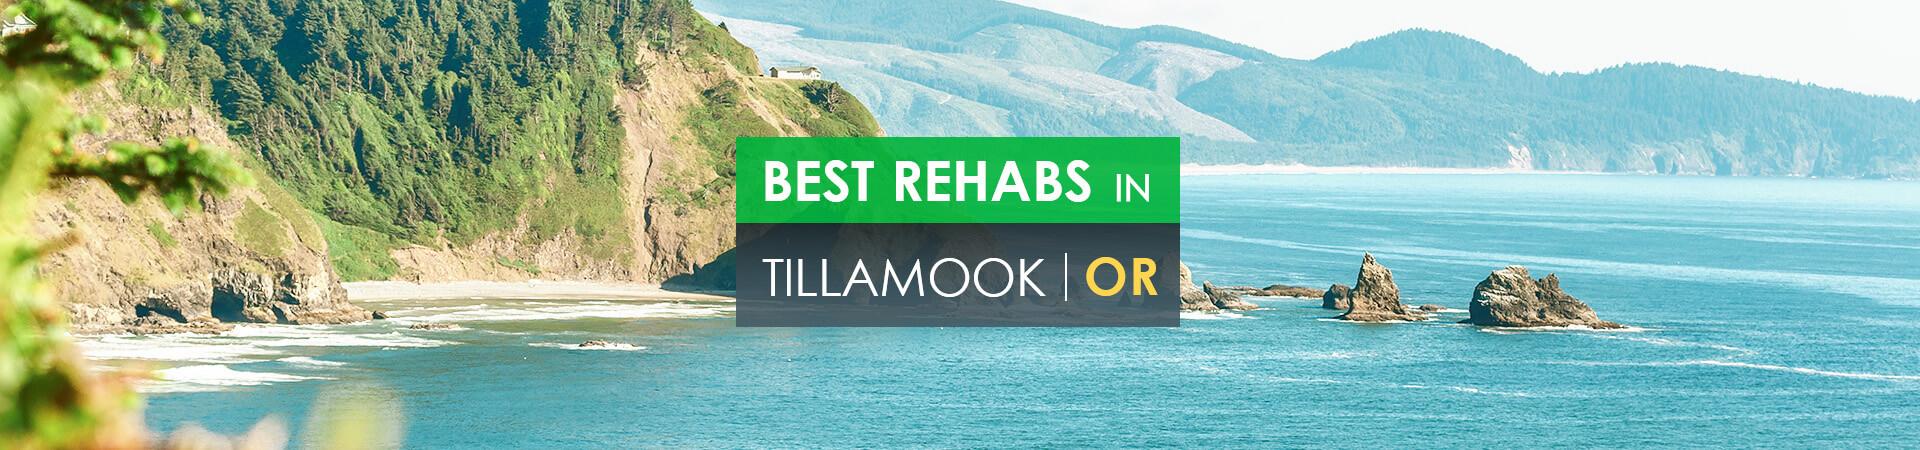 Best rehabs in Tillamook, OR